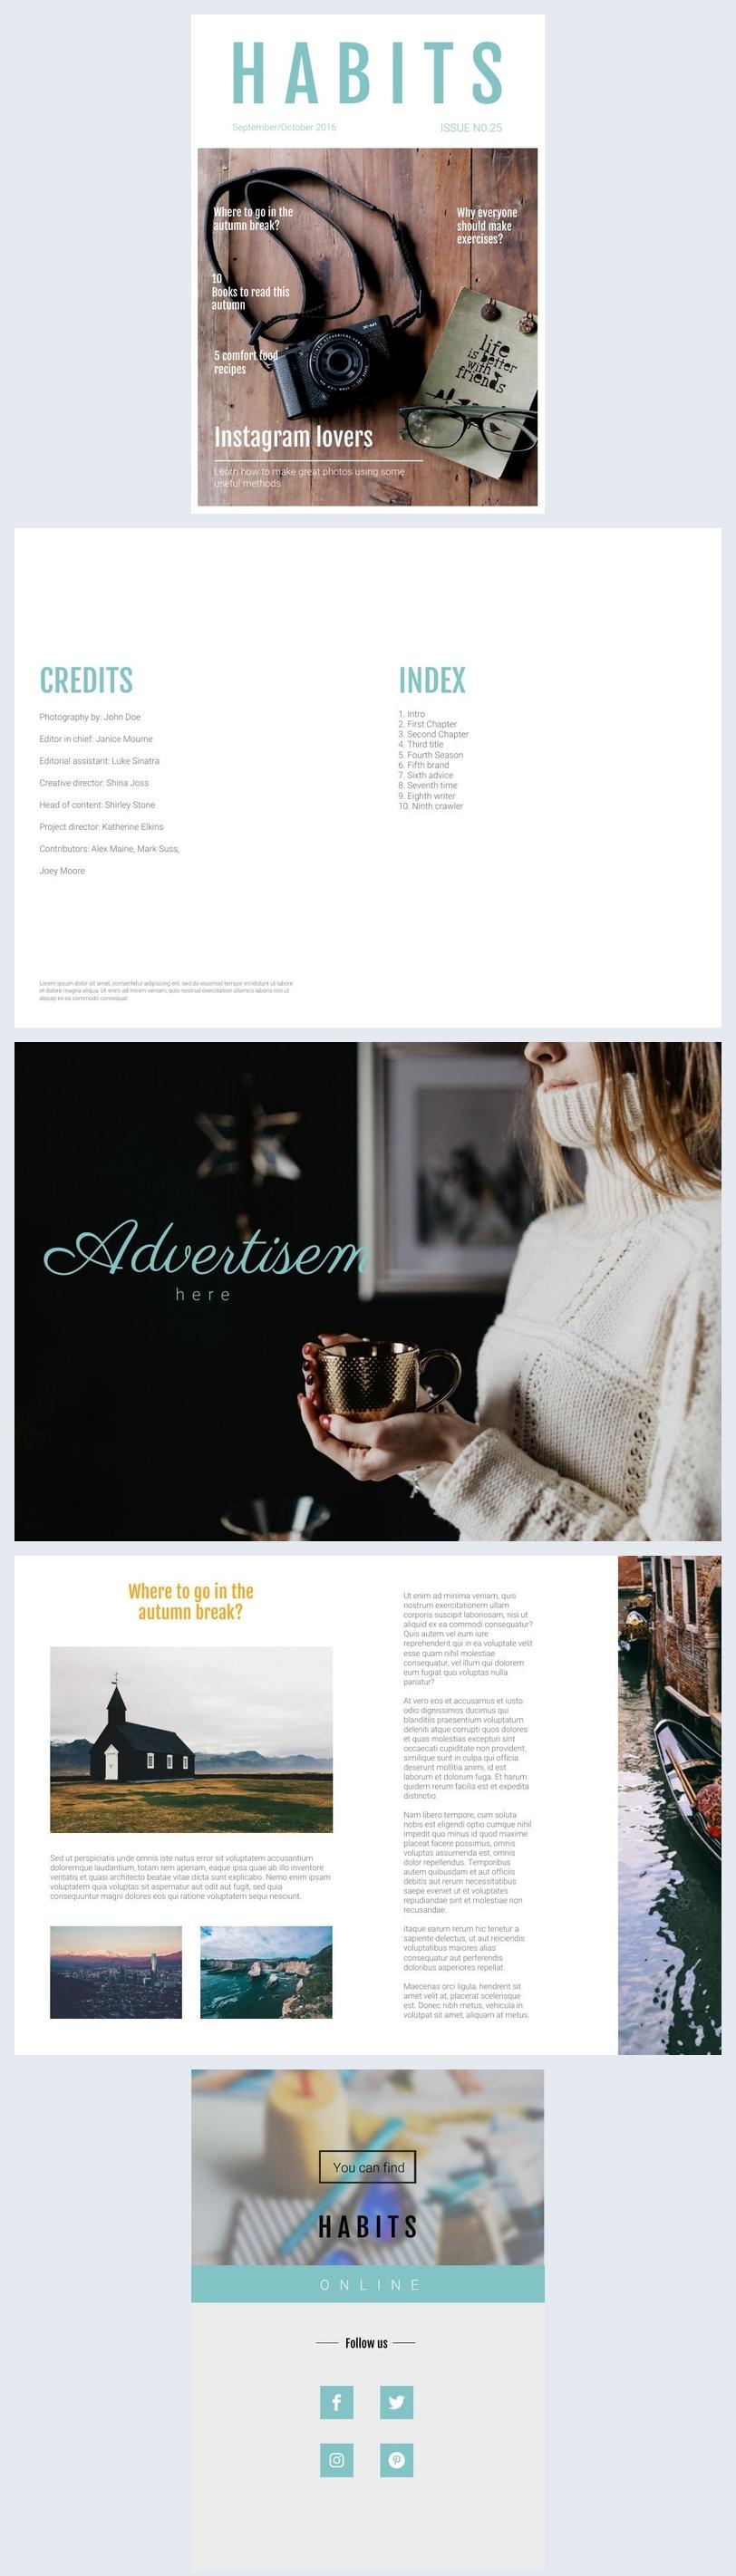 Women's Lifestyle Magazine